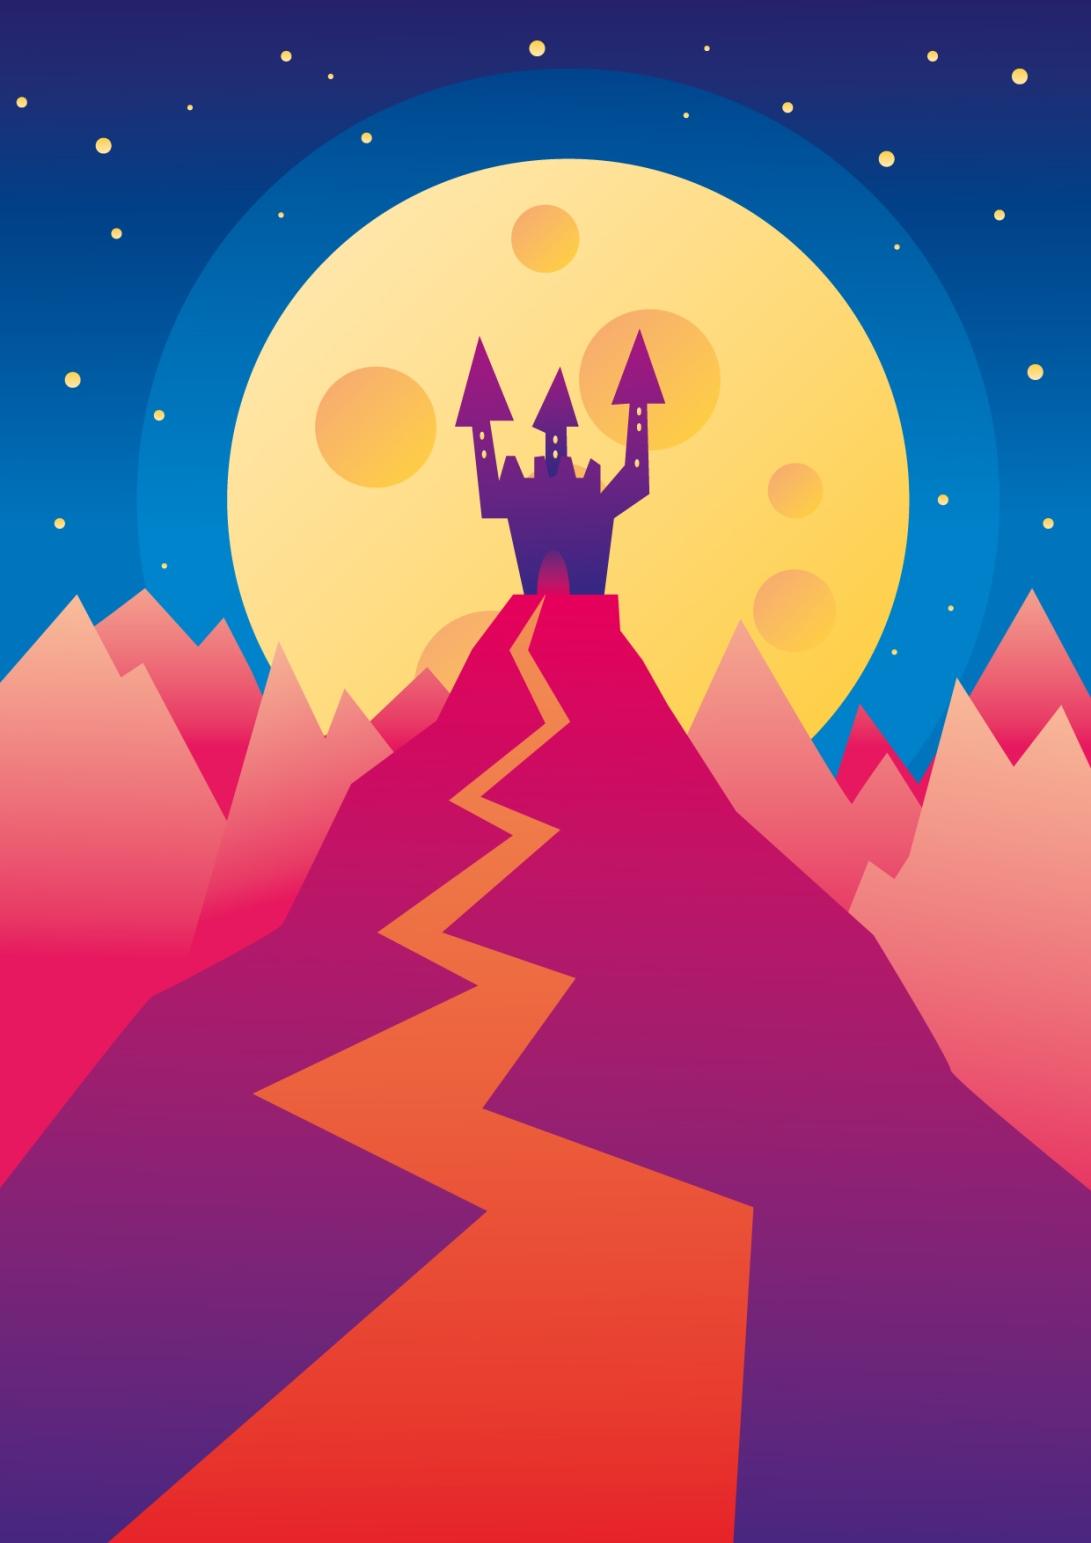 castle hill landscape moon dreamy mistery vector art illustration graphics design digital minimal design graphic design illustrator grafica denis bettio